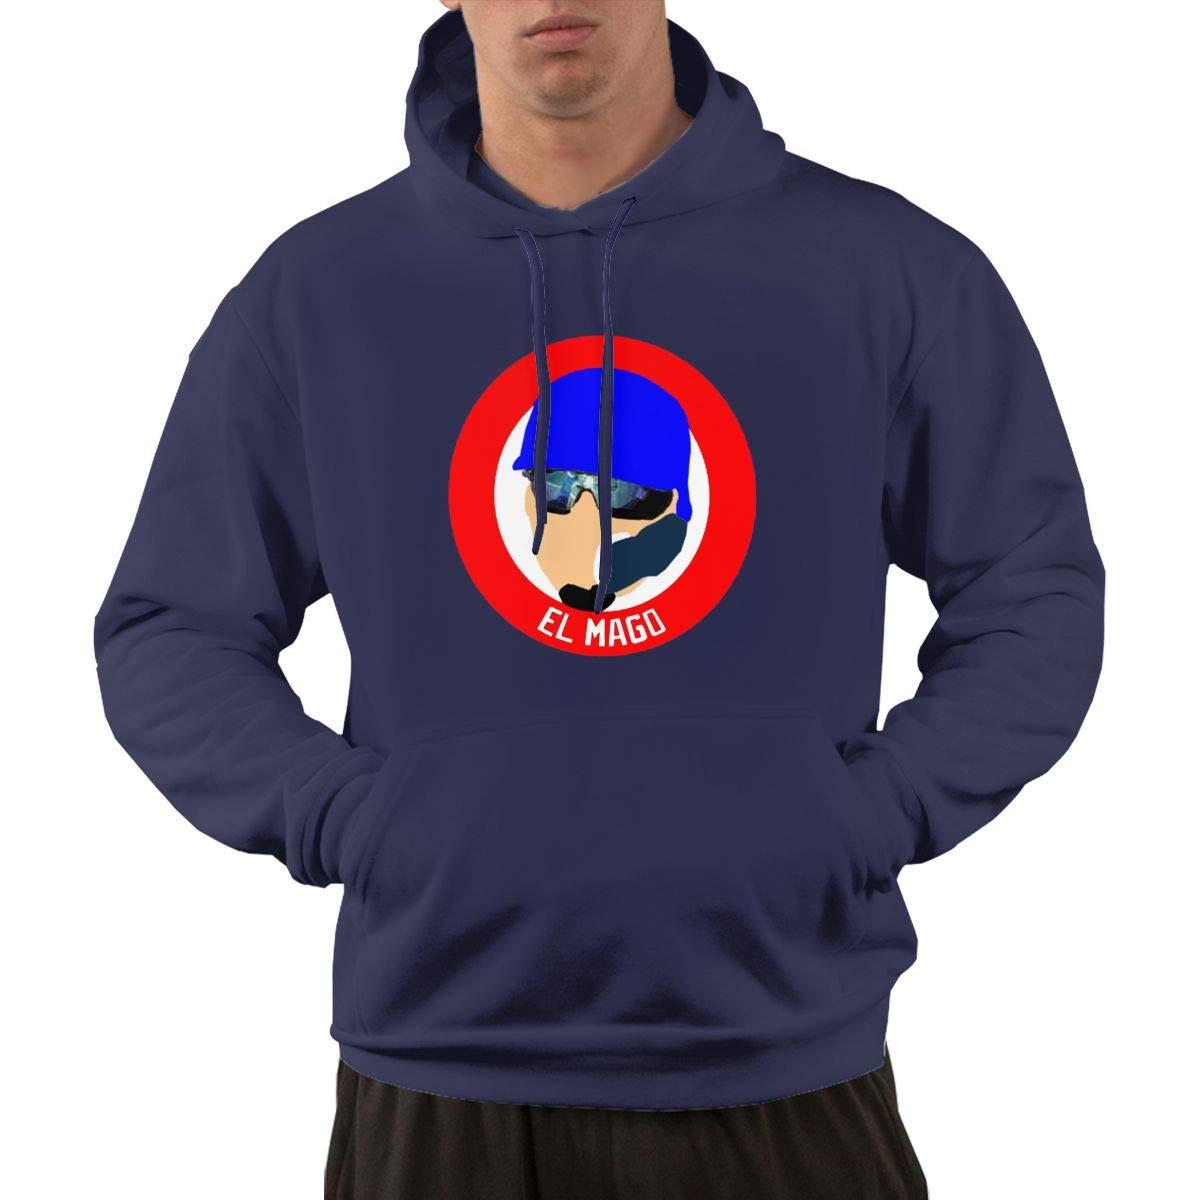 Veta Megica Mens Fashion Hoodies Chicago El Mago Casual Sweatshirt